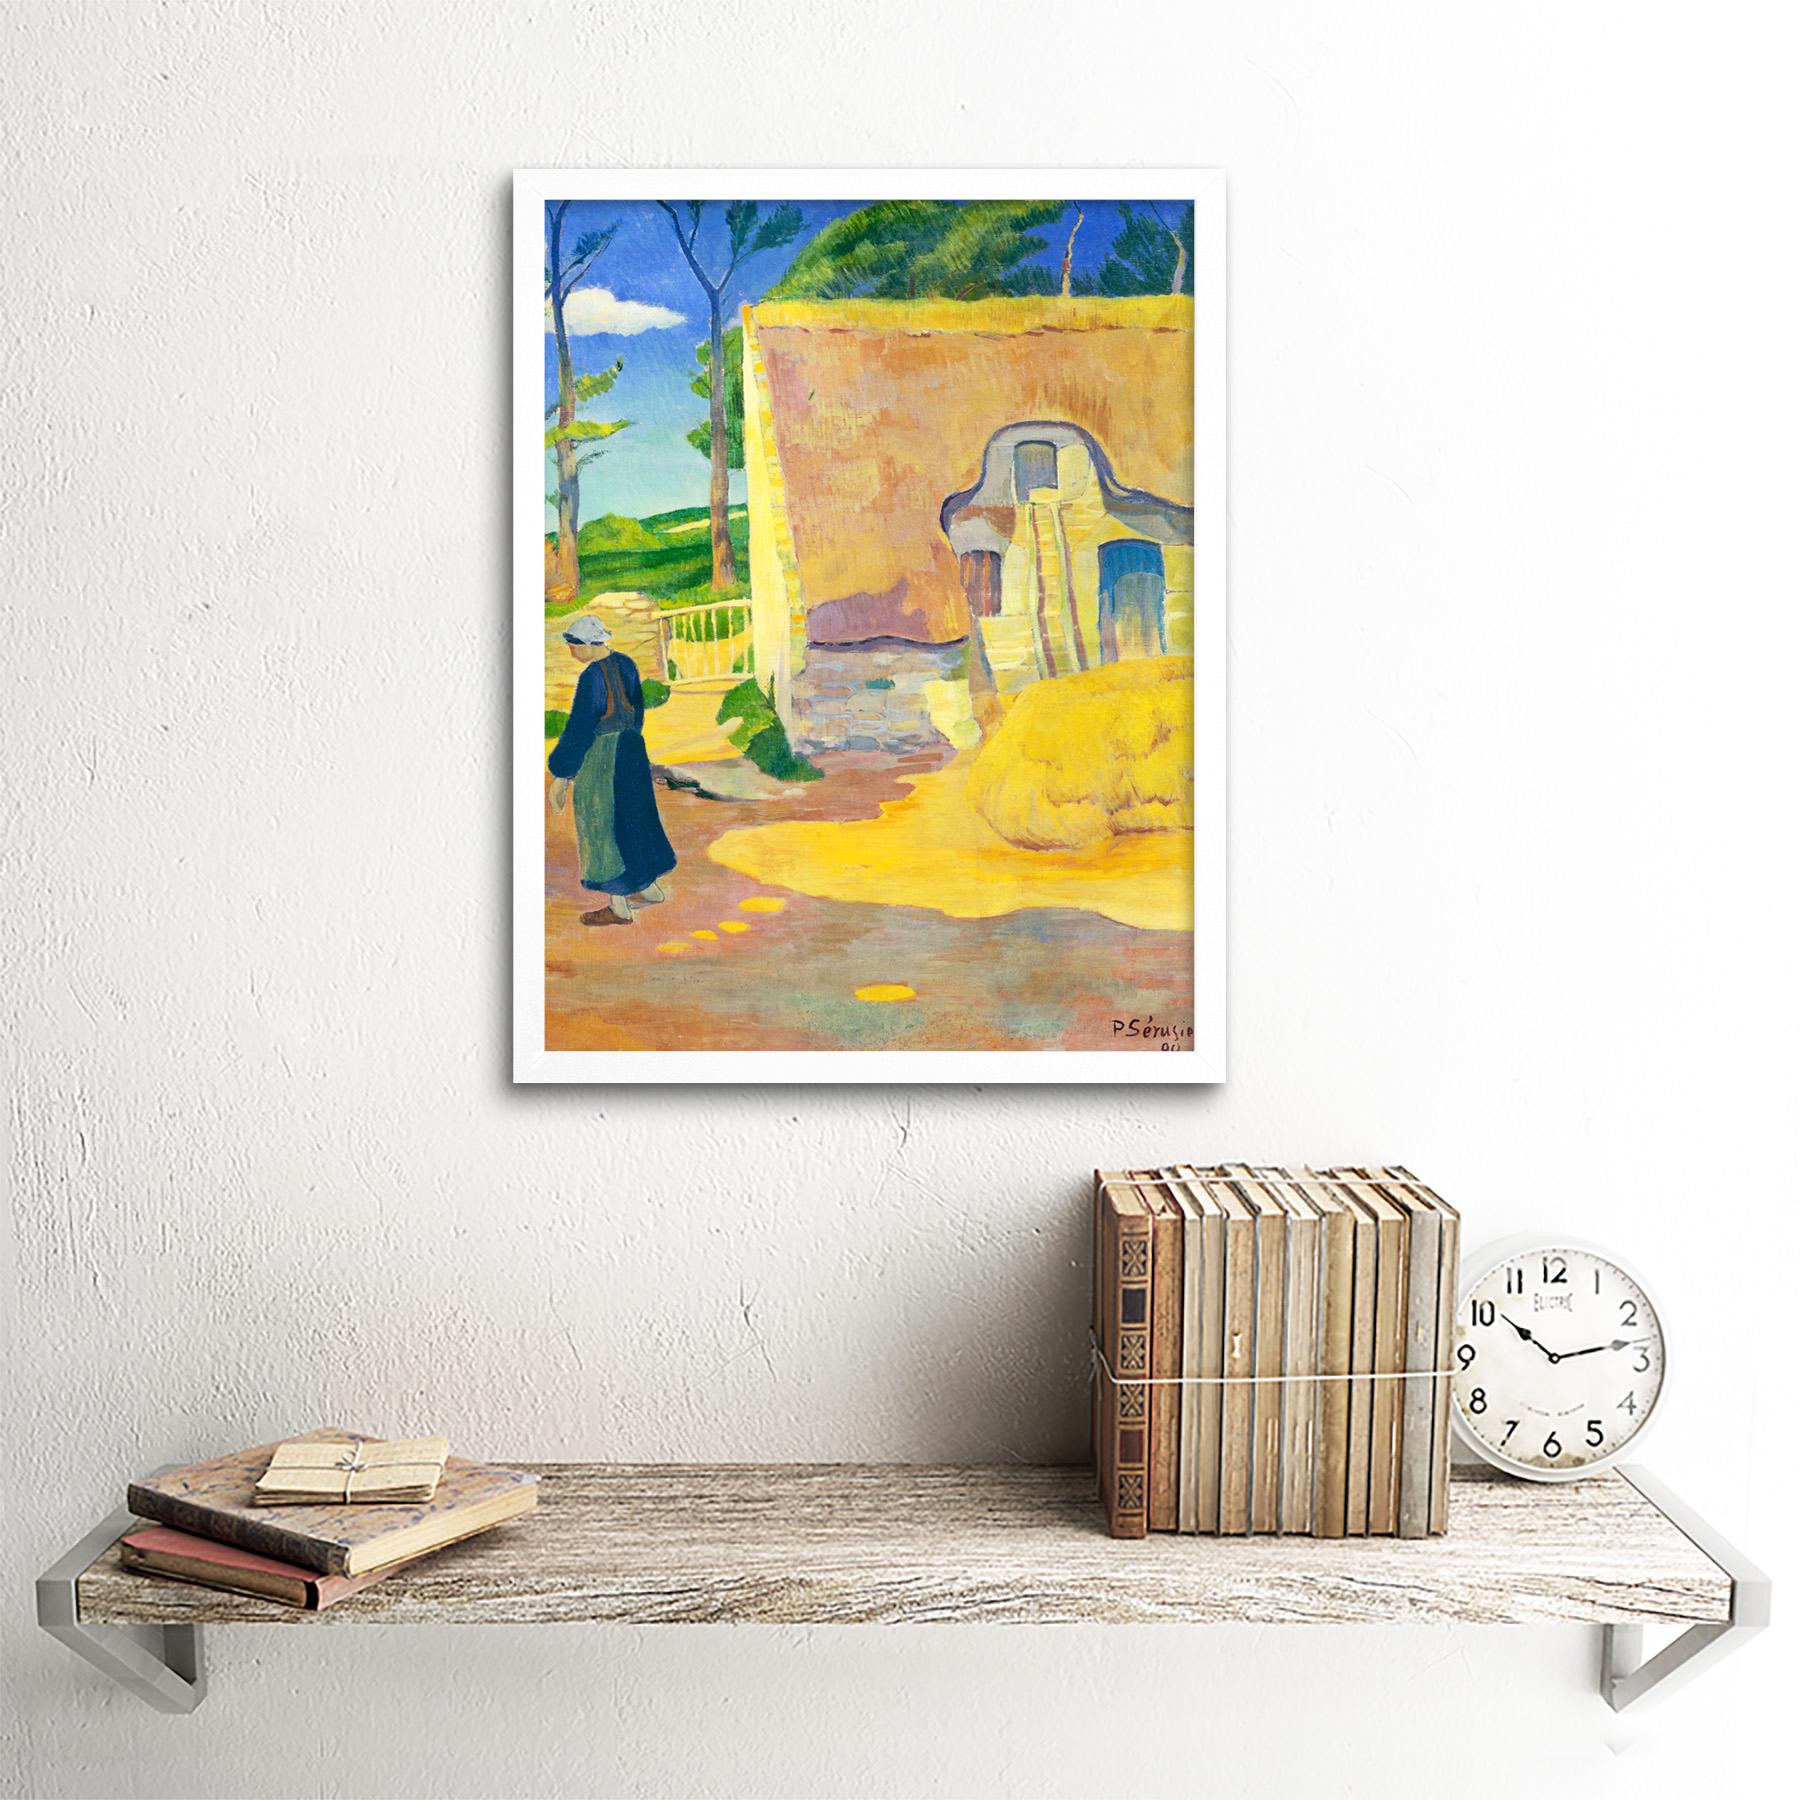 Serusier-Farmhouse-Le-Pouldu-Painting-Art-Print-Framed-12x16 thumbnail 18